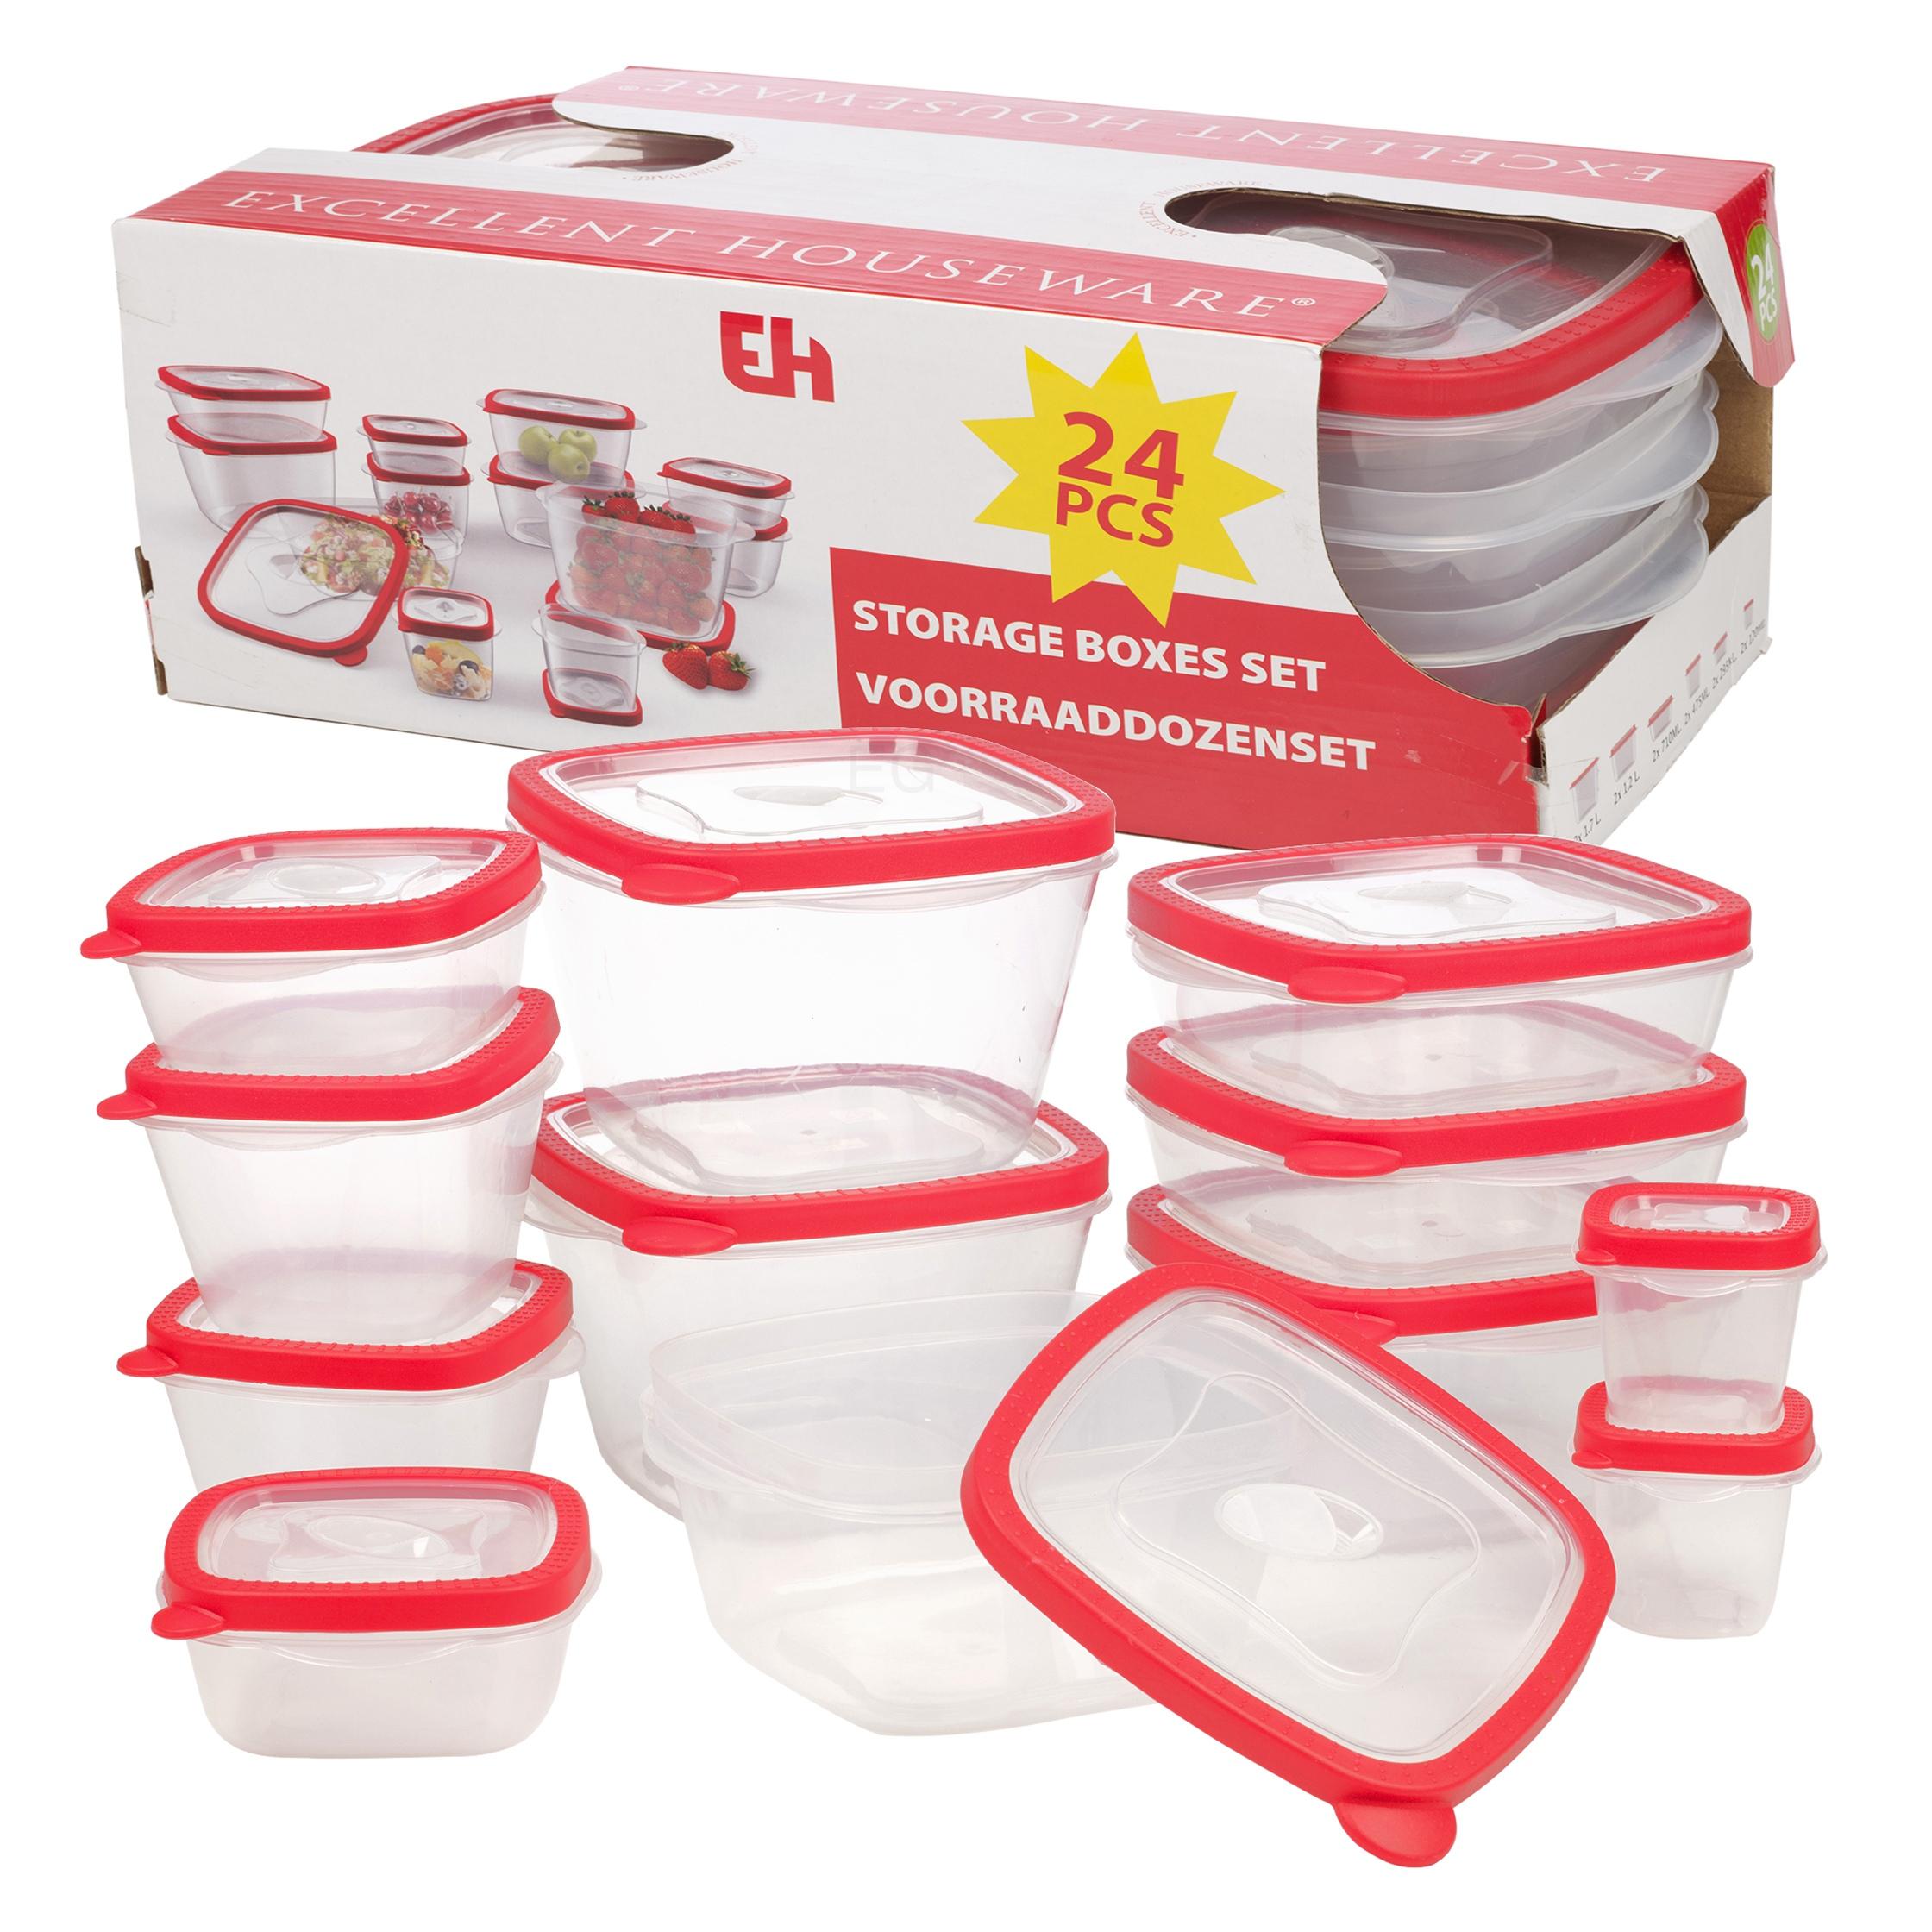 12 bpa free plastic food storage box containers lids set microwave dishwasher ebay. Black Bedroom Furniture Sets. Home Design Ideas